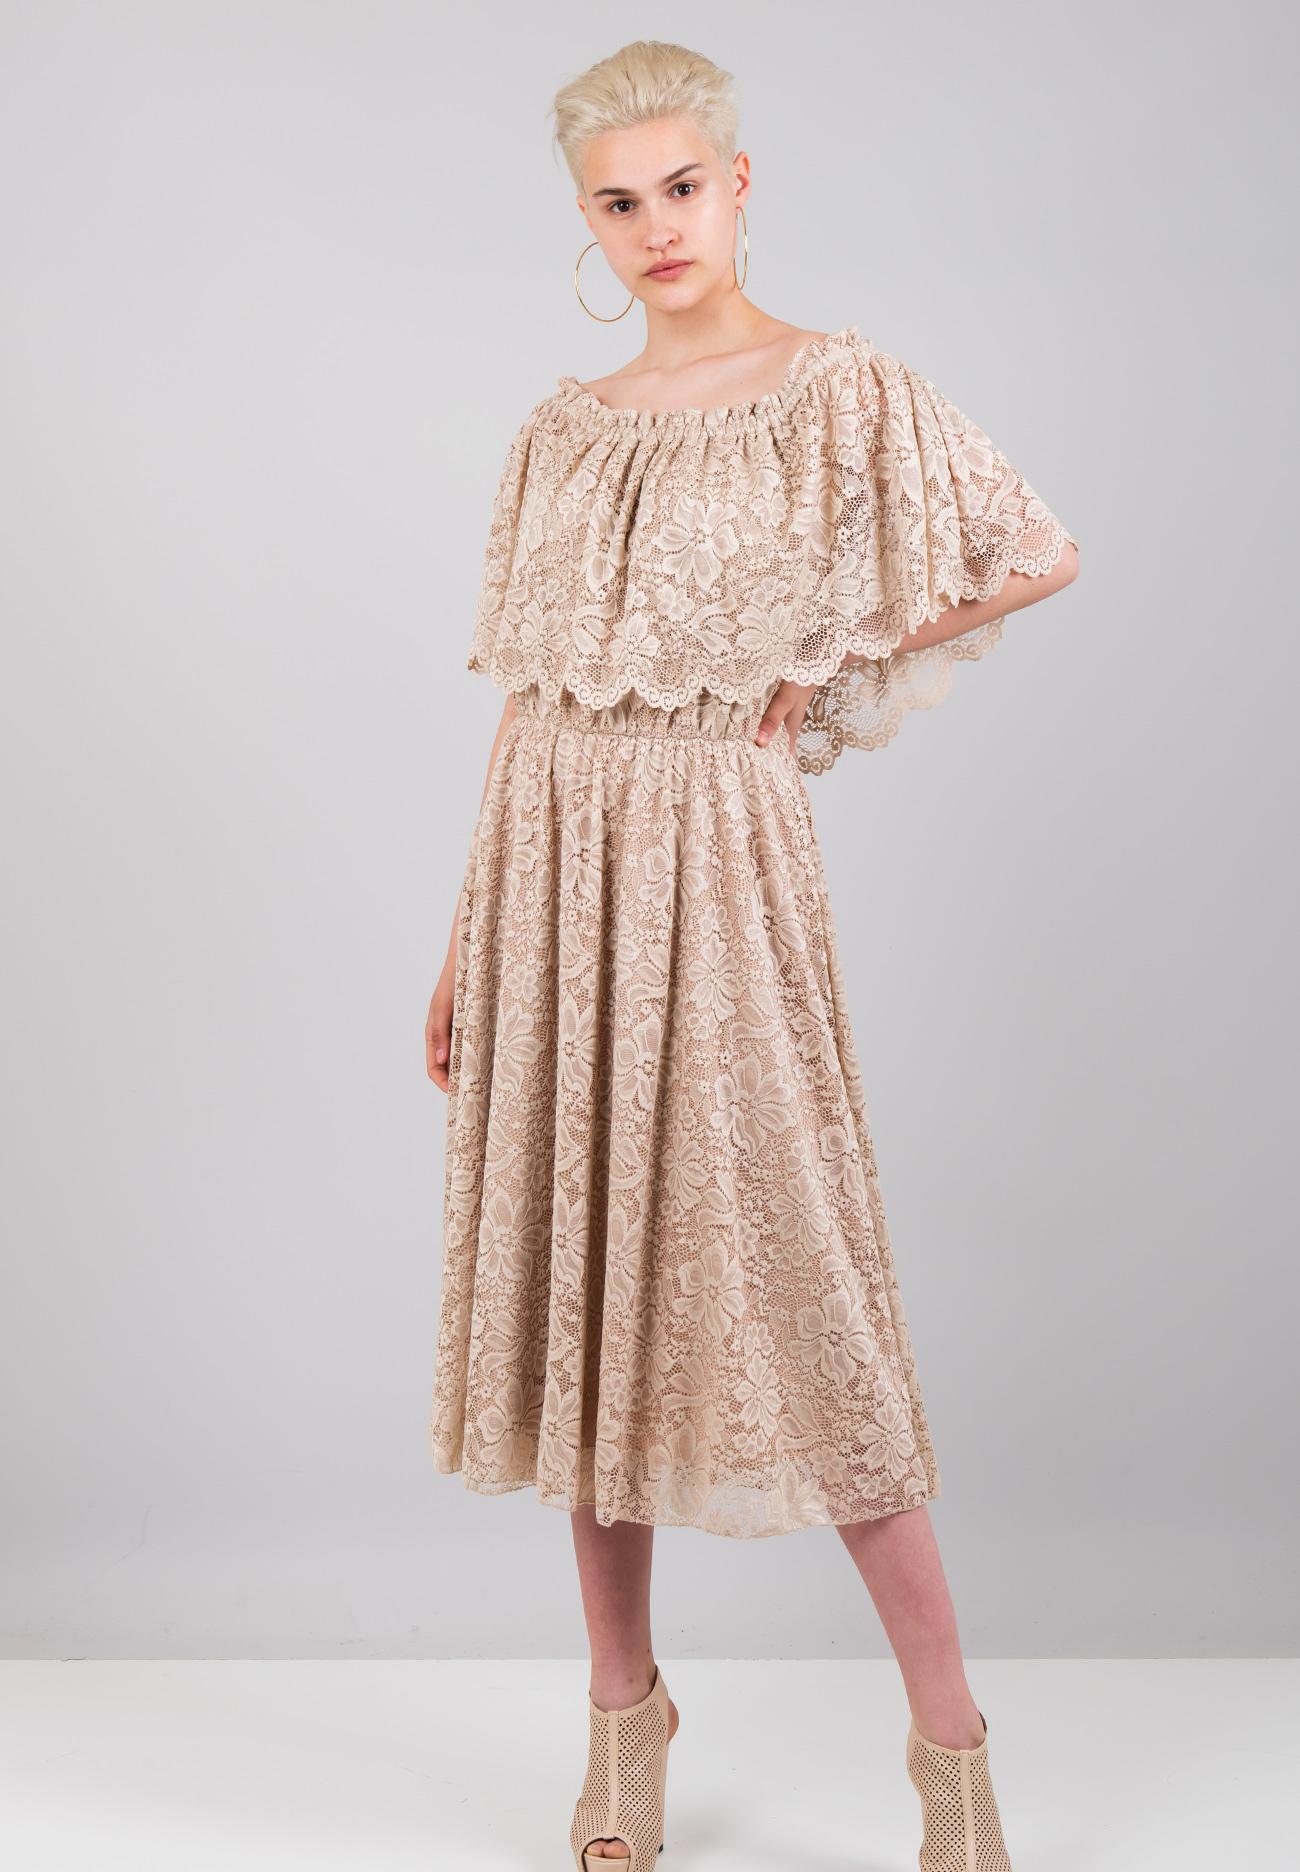 f28c11f5f99d Μίντι δαντελένιο φόρεμα - ZIC ZAC